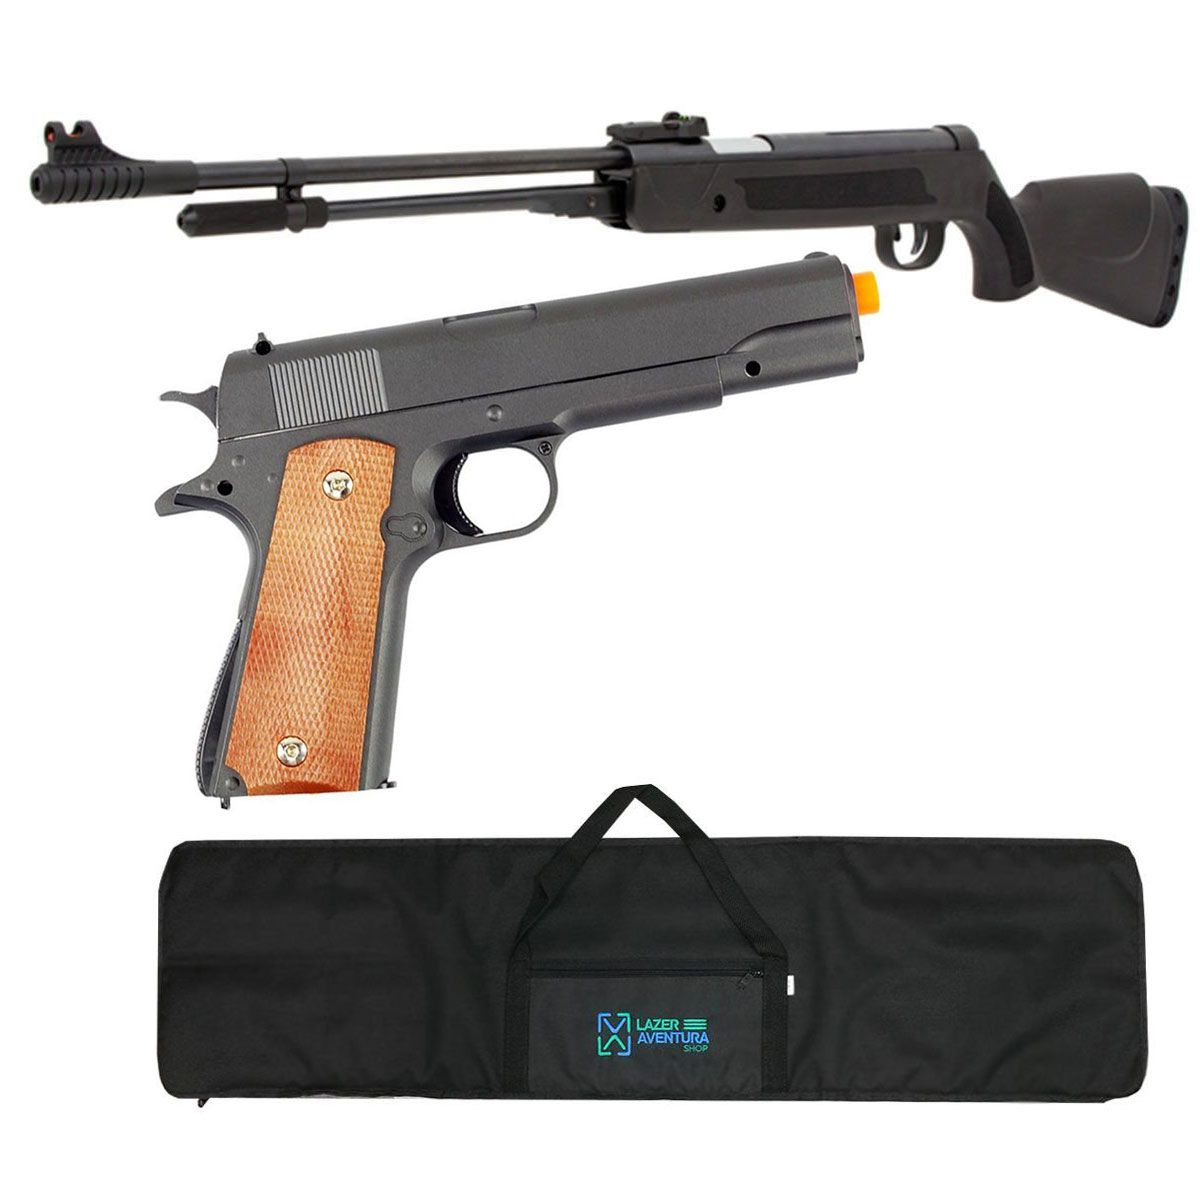 Kit Carabina Fixxar 5,5mm + Pistola G13 + Capa Lazer e Aventura